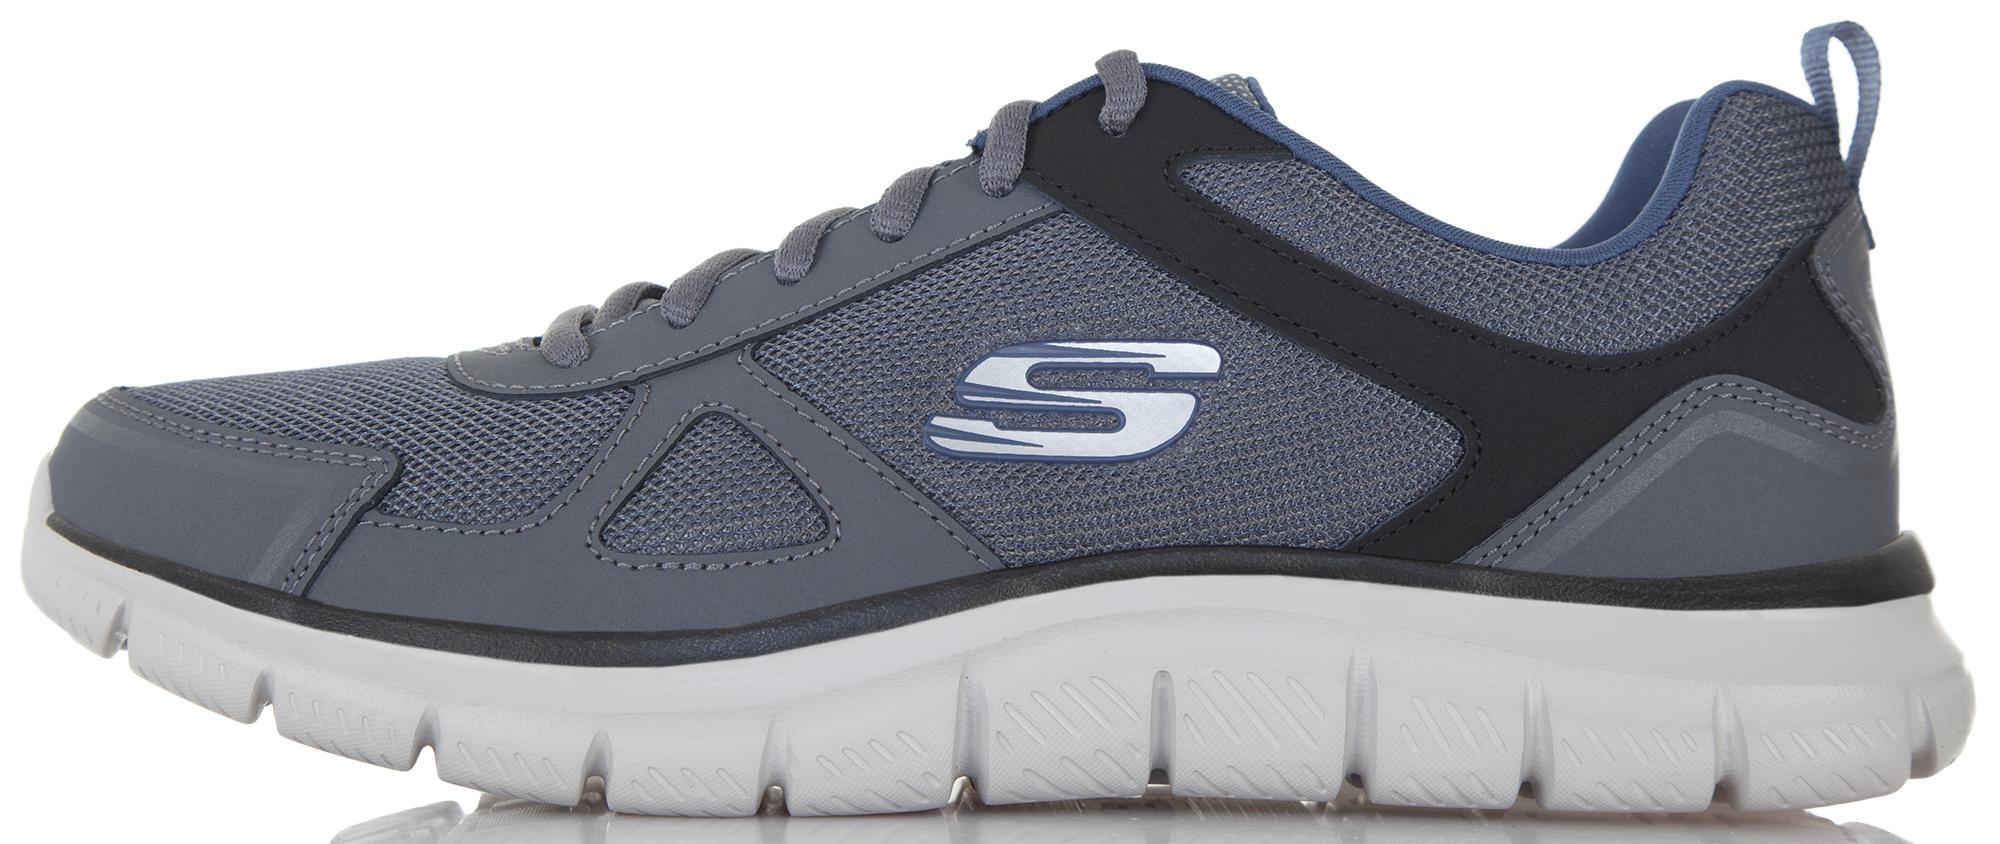 Skechers Кроссовки мужские Skechers Track, размер 46,5